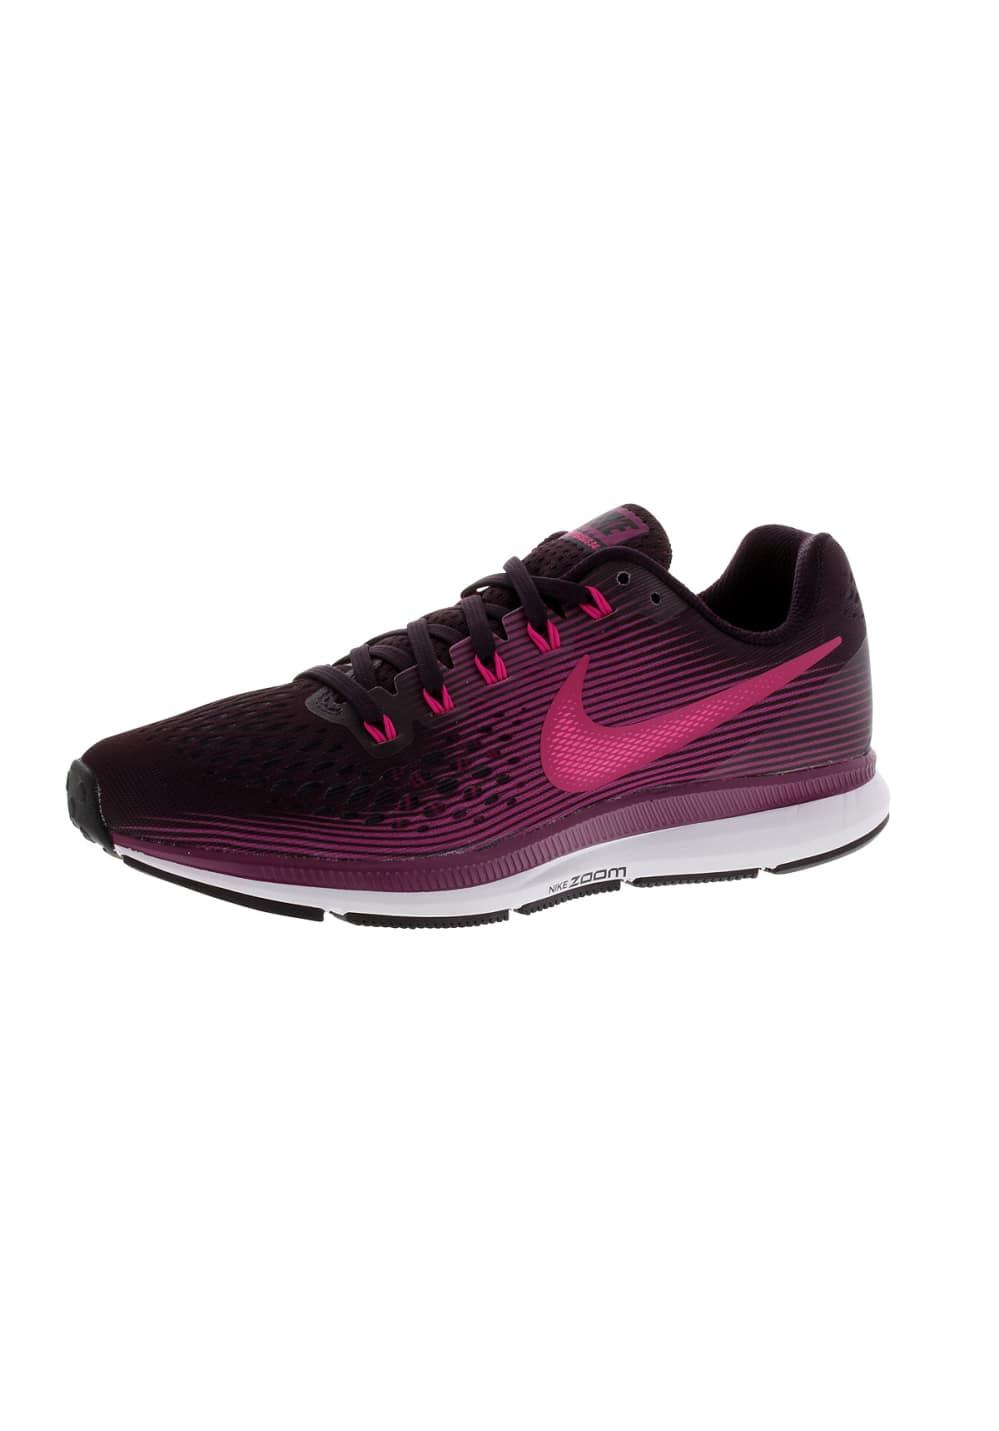 ffb1edcad2599 Next. -60%. Nike. Air Zoom Pegasus 34 - Zapatillas de running para Mujer